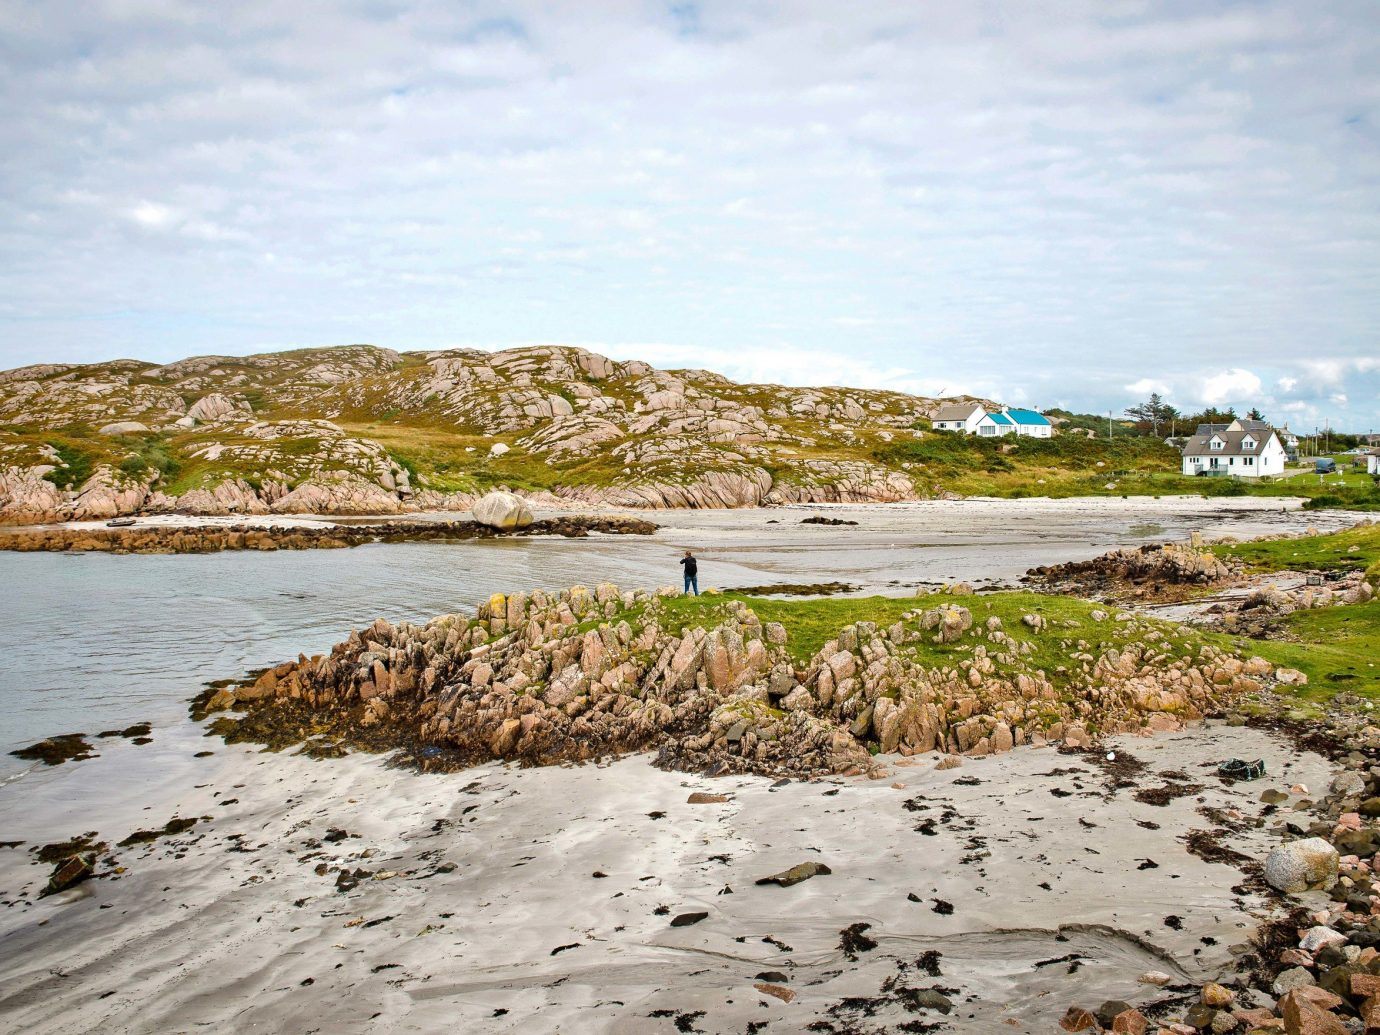 Trip Ideas outdoor Coast shore Nature headland Sea coastal and oceanic landforms promontory Beach loch bay sky Ocean cove cape water inlet bank tide sandy